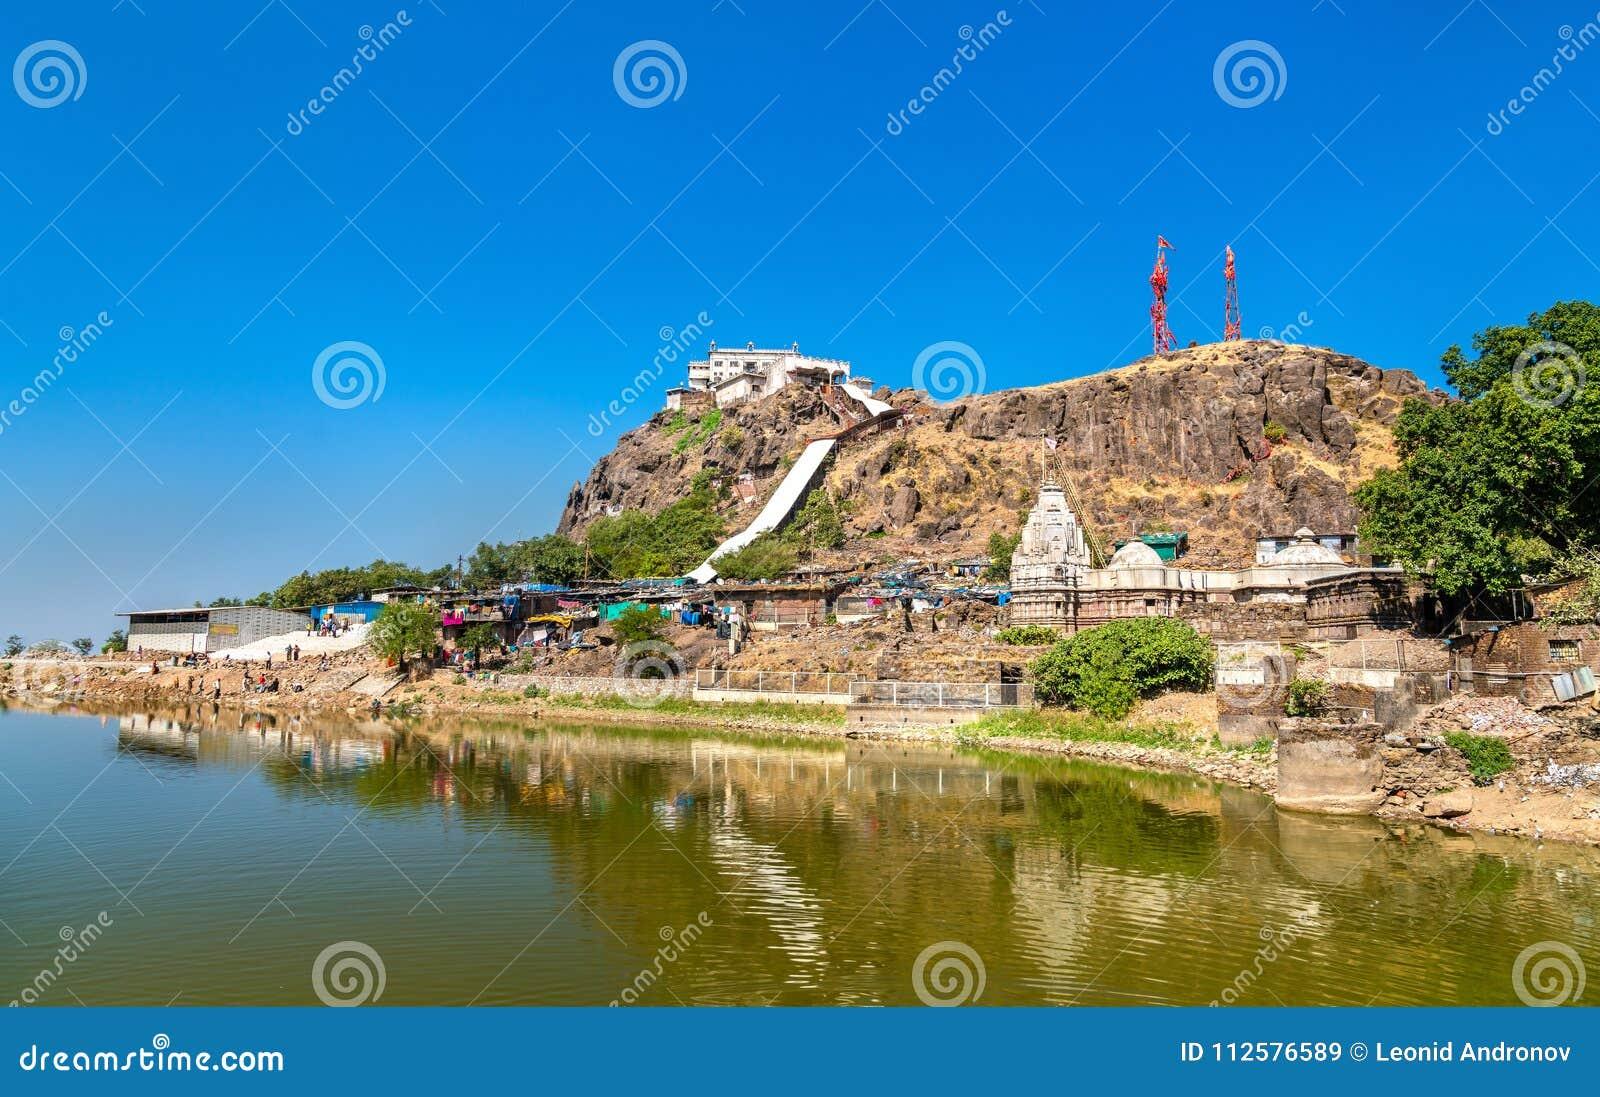 Dudhiyu Talav湖和Kalika末多寺庙在Pavagadh小山-古杰雷特,印度山顶